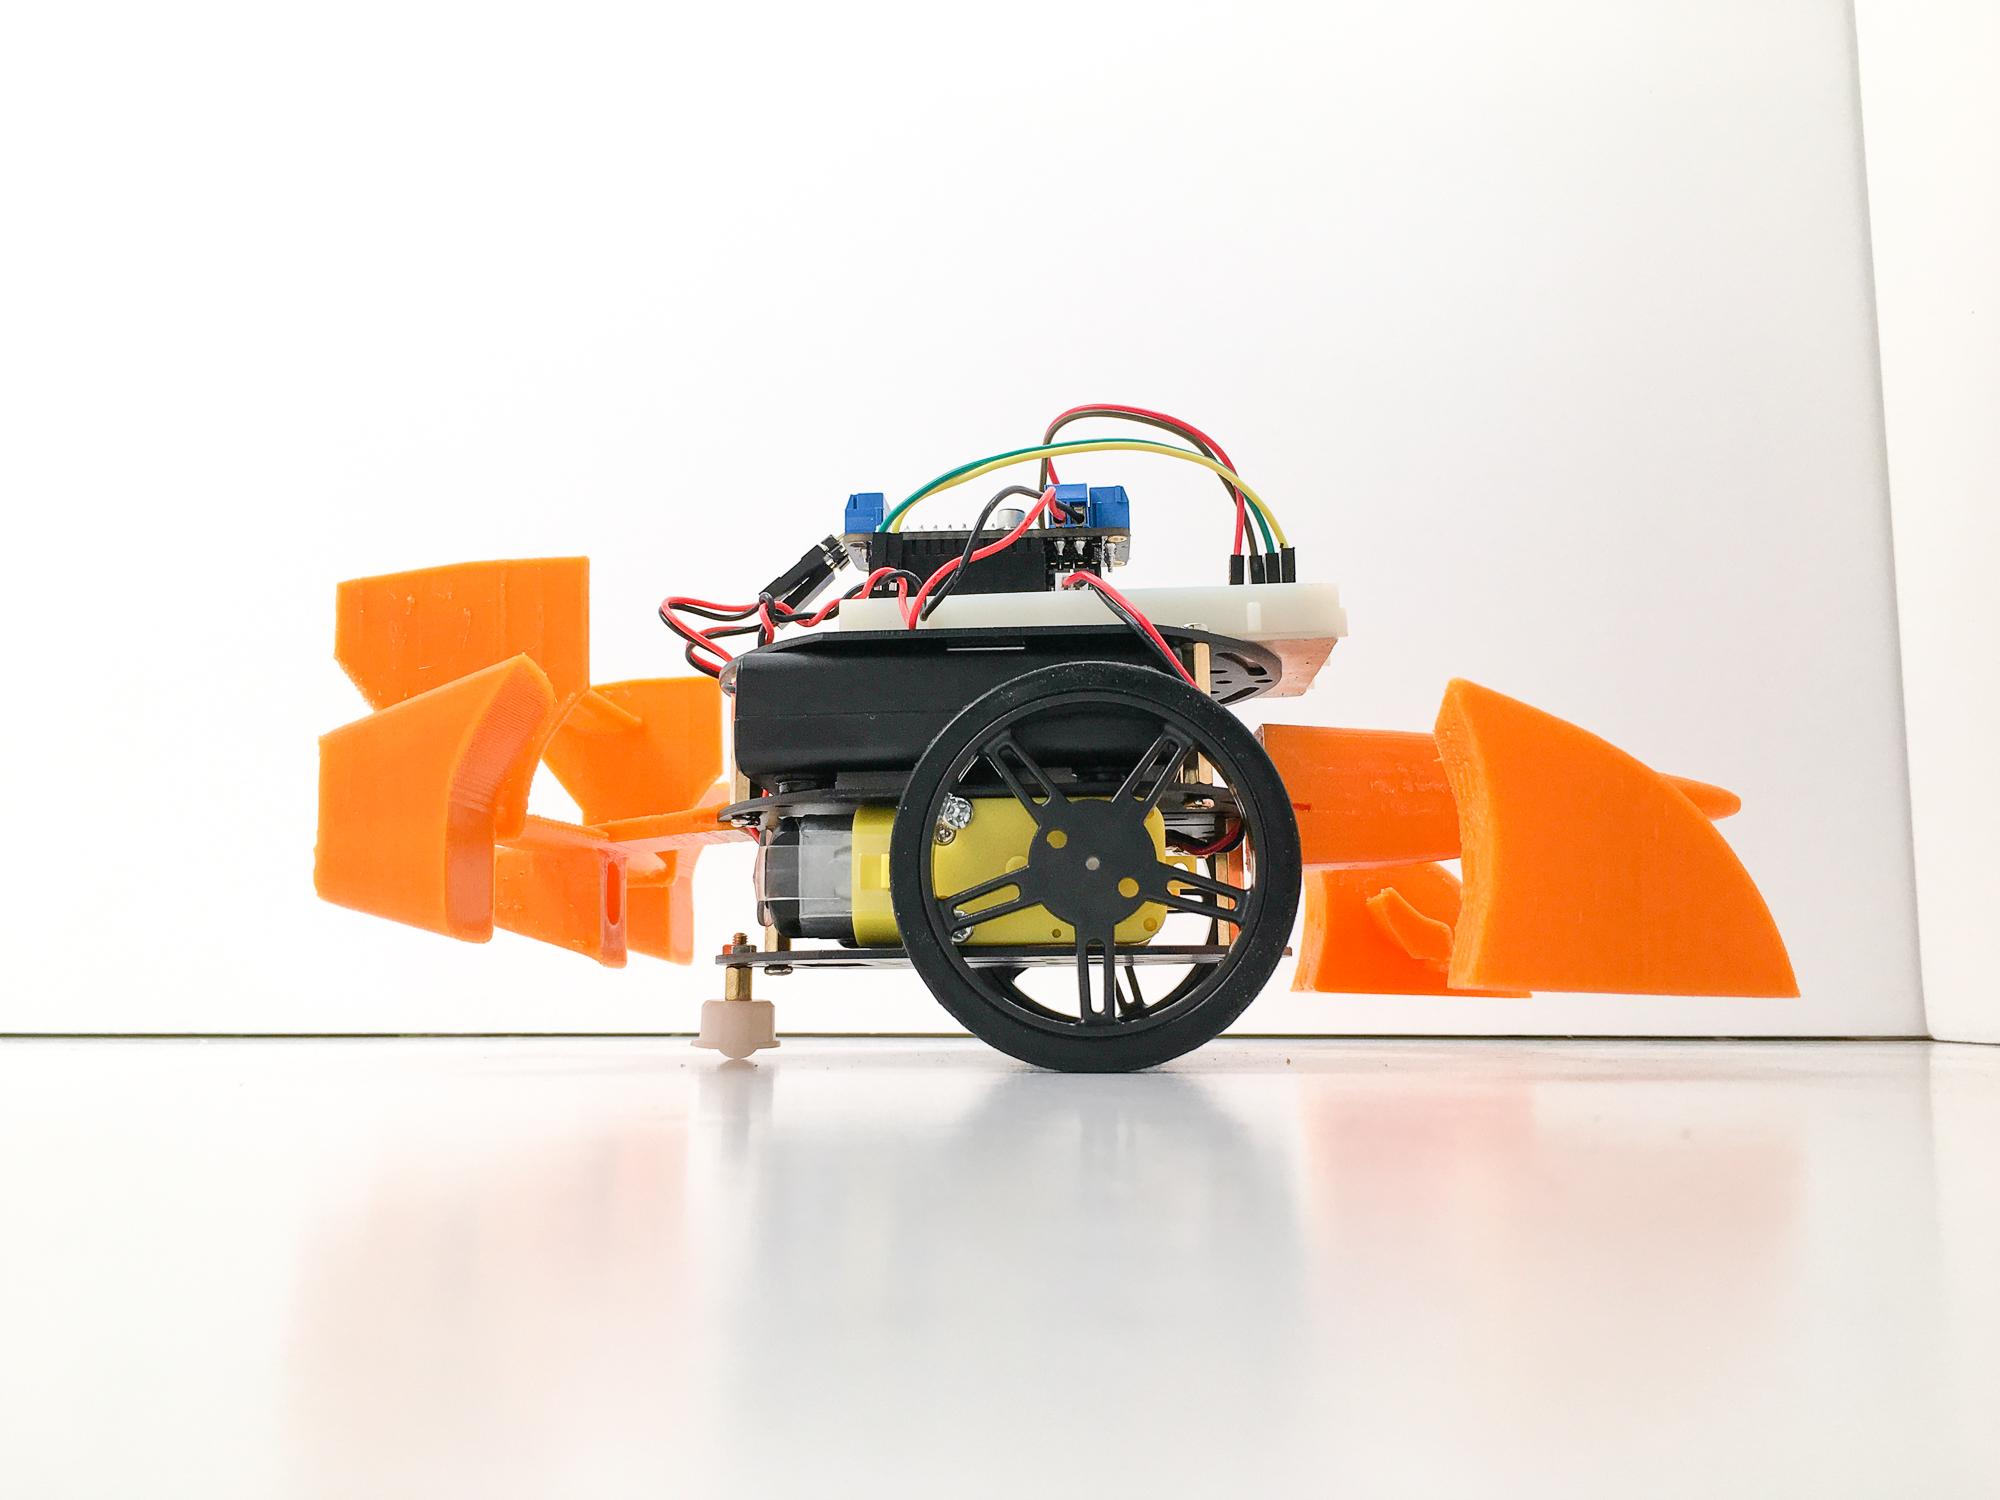 robotics_IMG_0068_2k.jpg